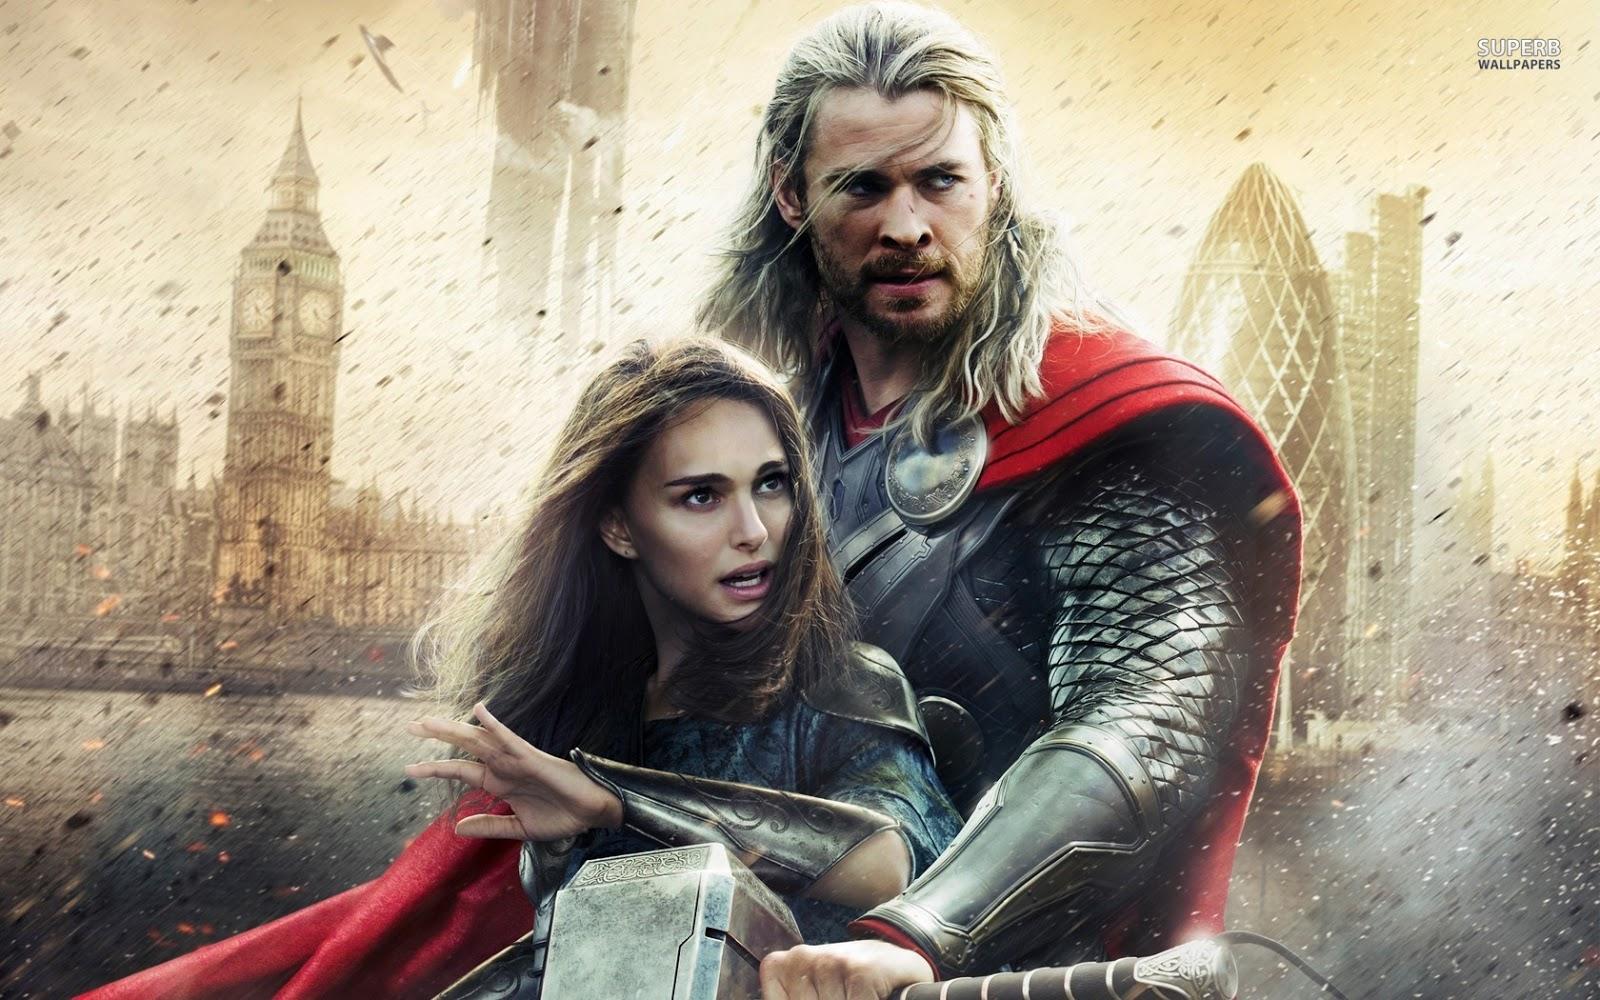 Natalie Portman Thor Movie Poster Wallpaper